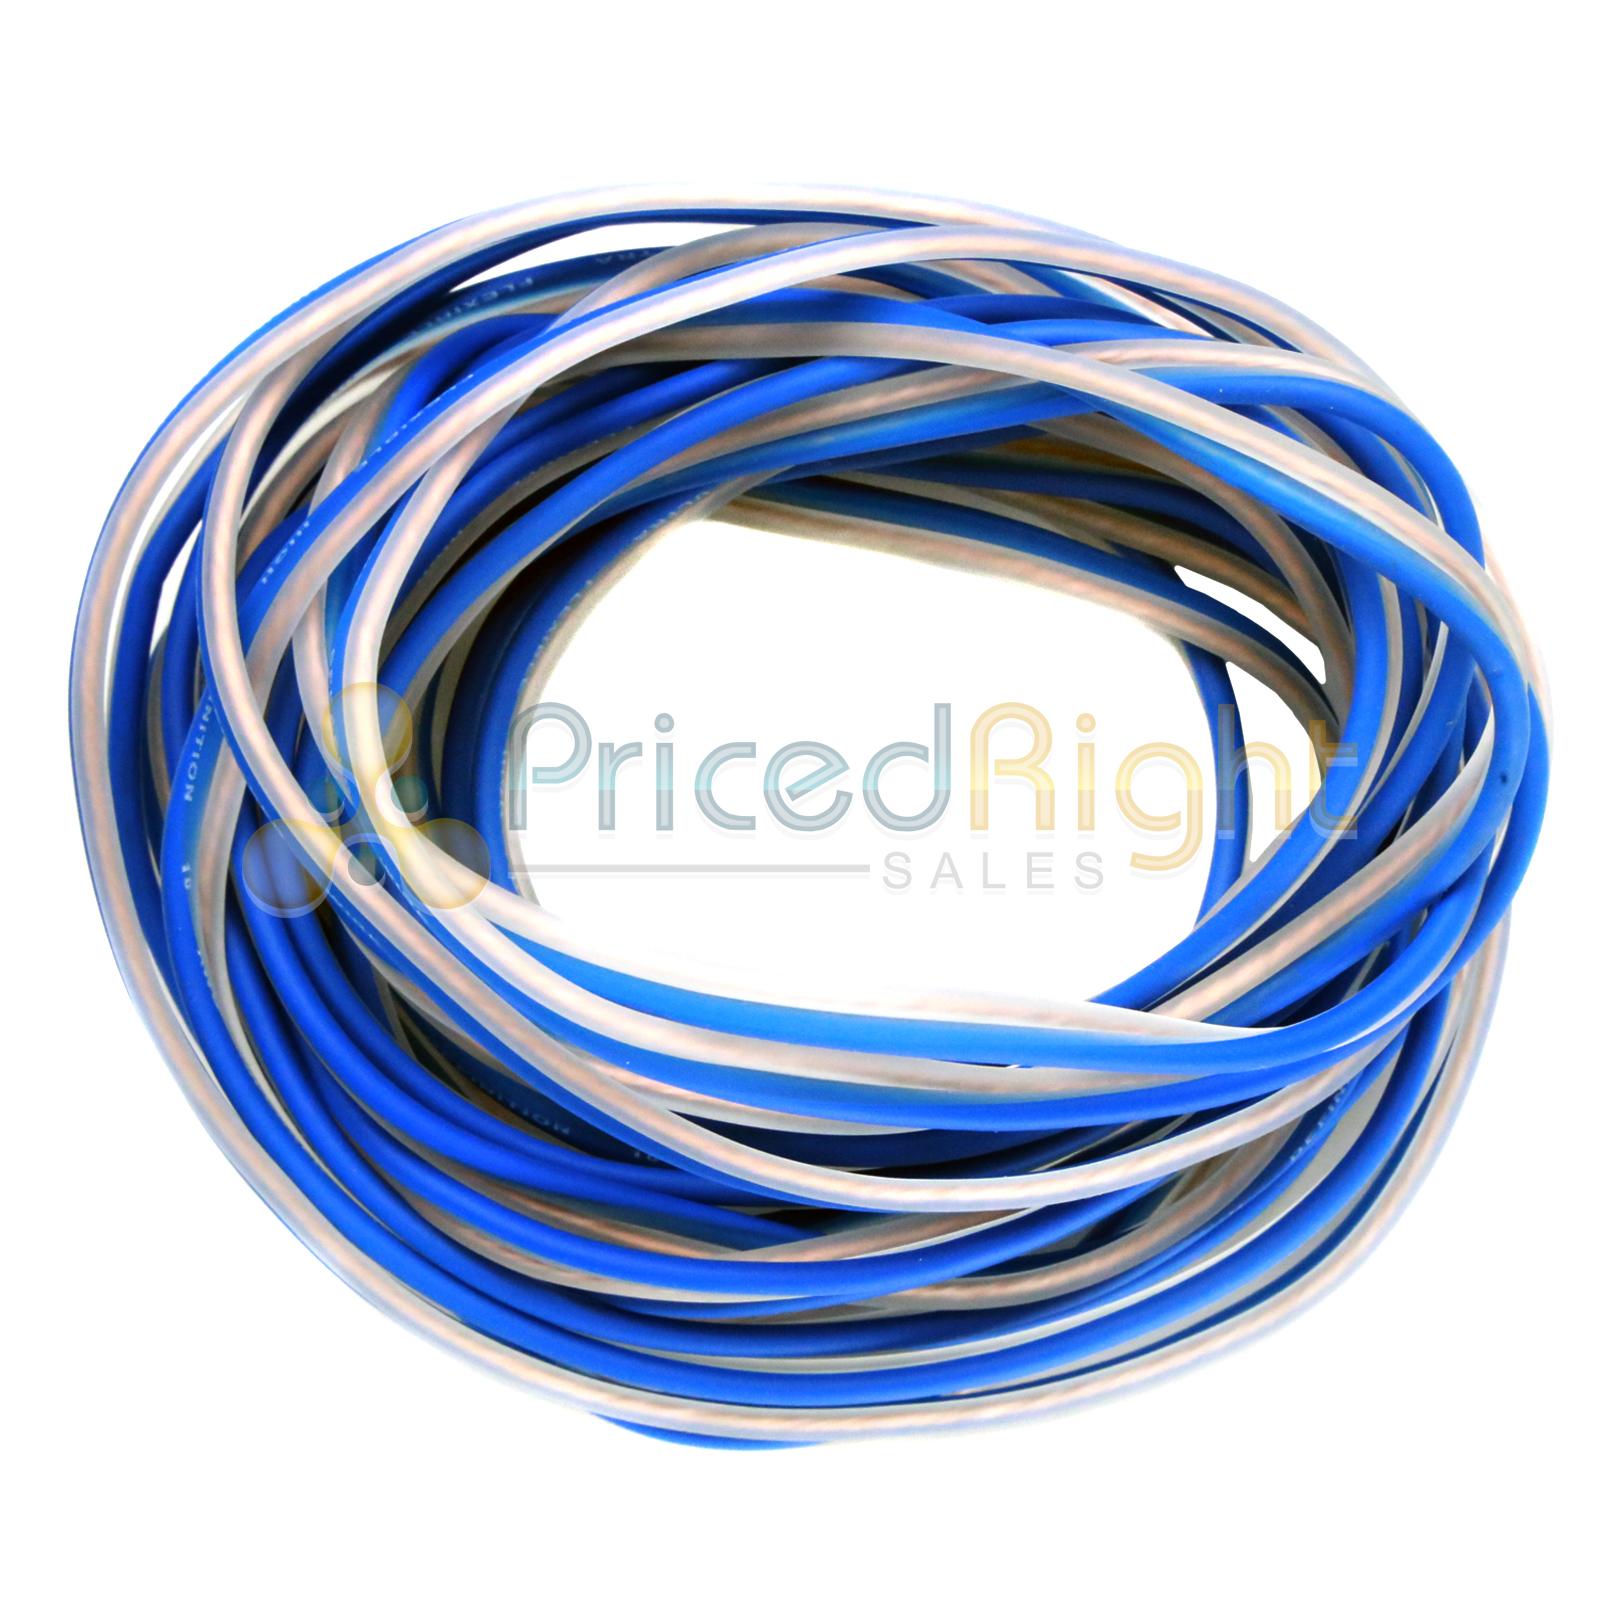 orion brand 4 awg gauge wire amp kit amplifier install wiring complete 4 ga ebay. Black Bedroom Furniture Sets. Home Design Ideas